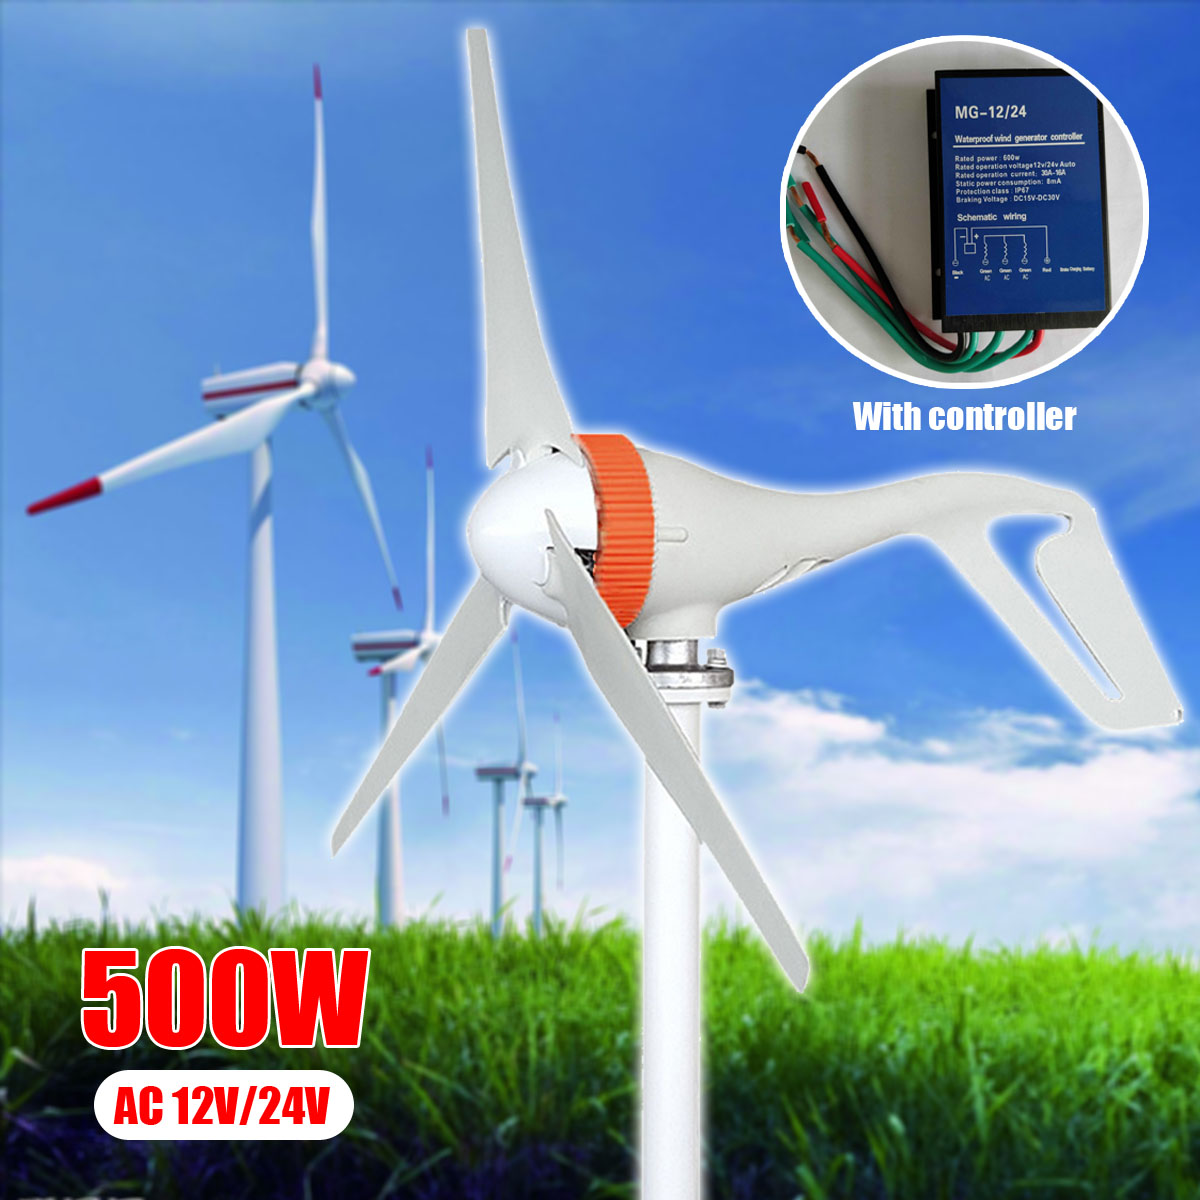 Ac 12v 24v 500w Miniature Wind Turbines Generator Mini Diagram Also Power Diagrams On Turbine 600 Watt Complete Kit 6pcs 100w Photovoltaic Pv Solar Panel Sytem Rv Boat Generators